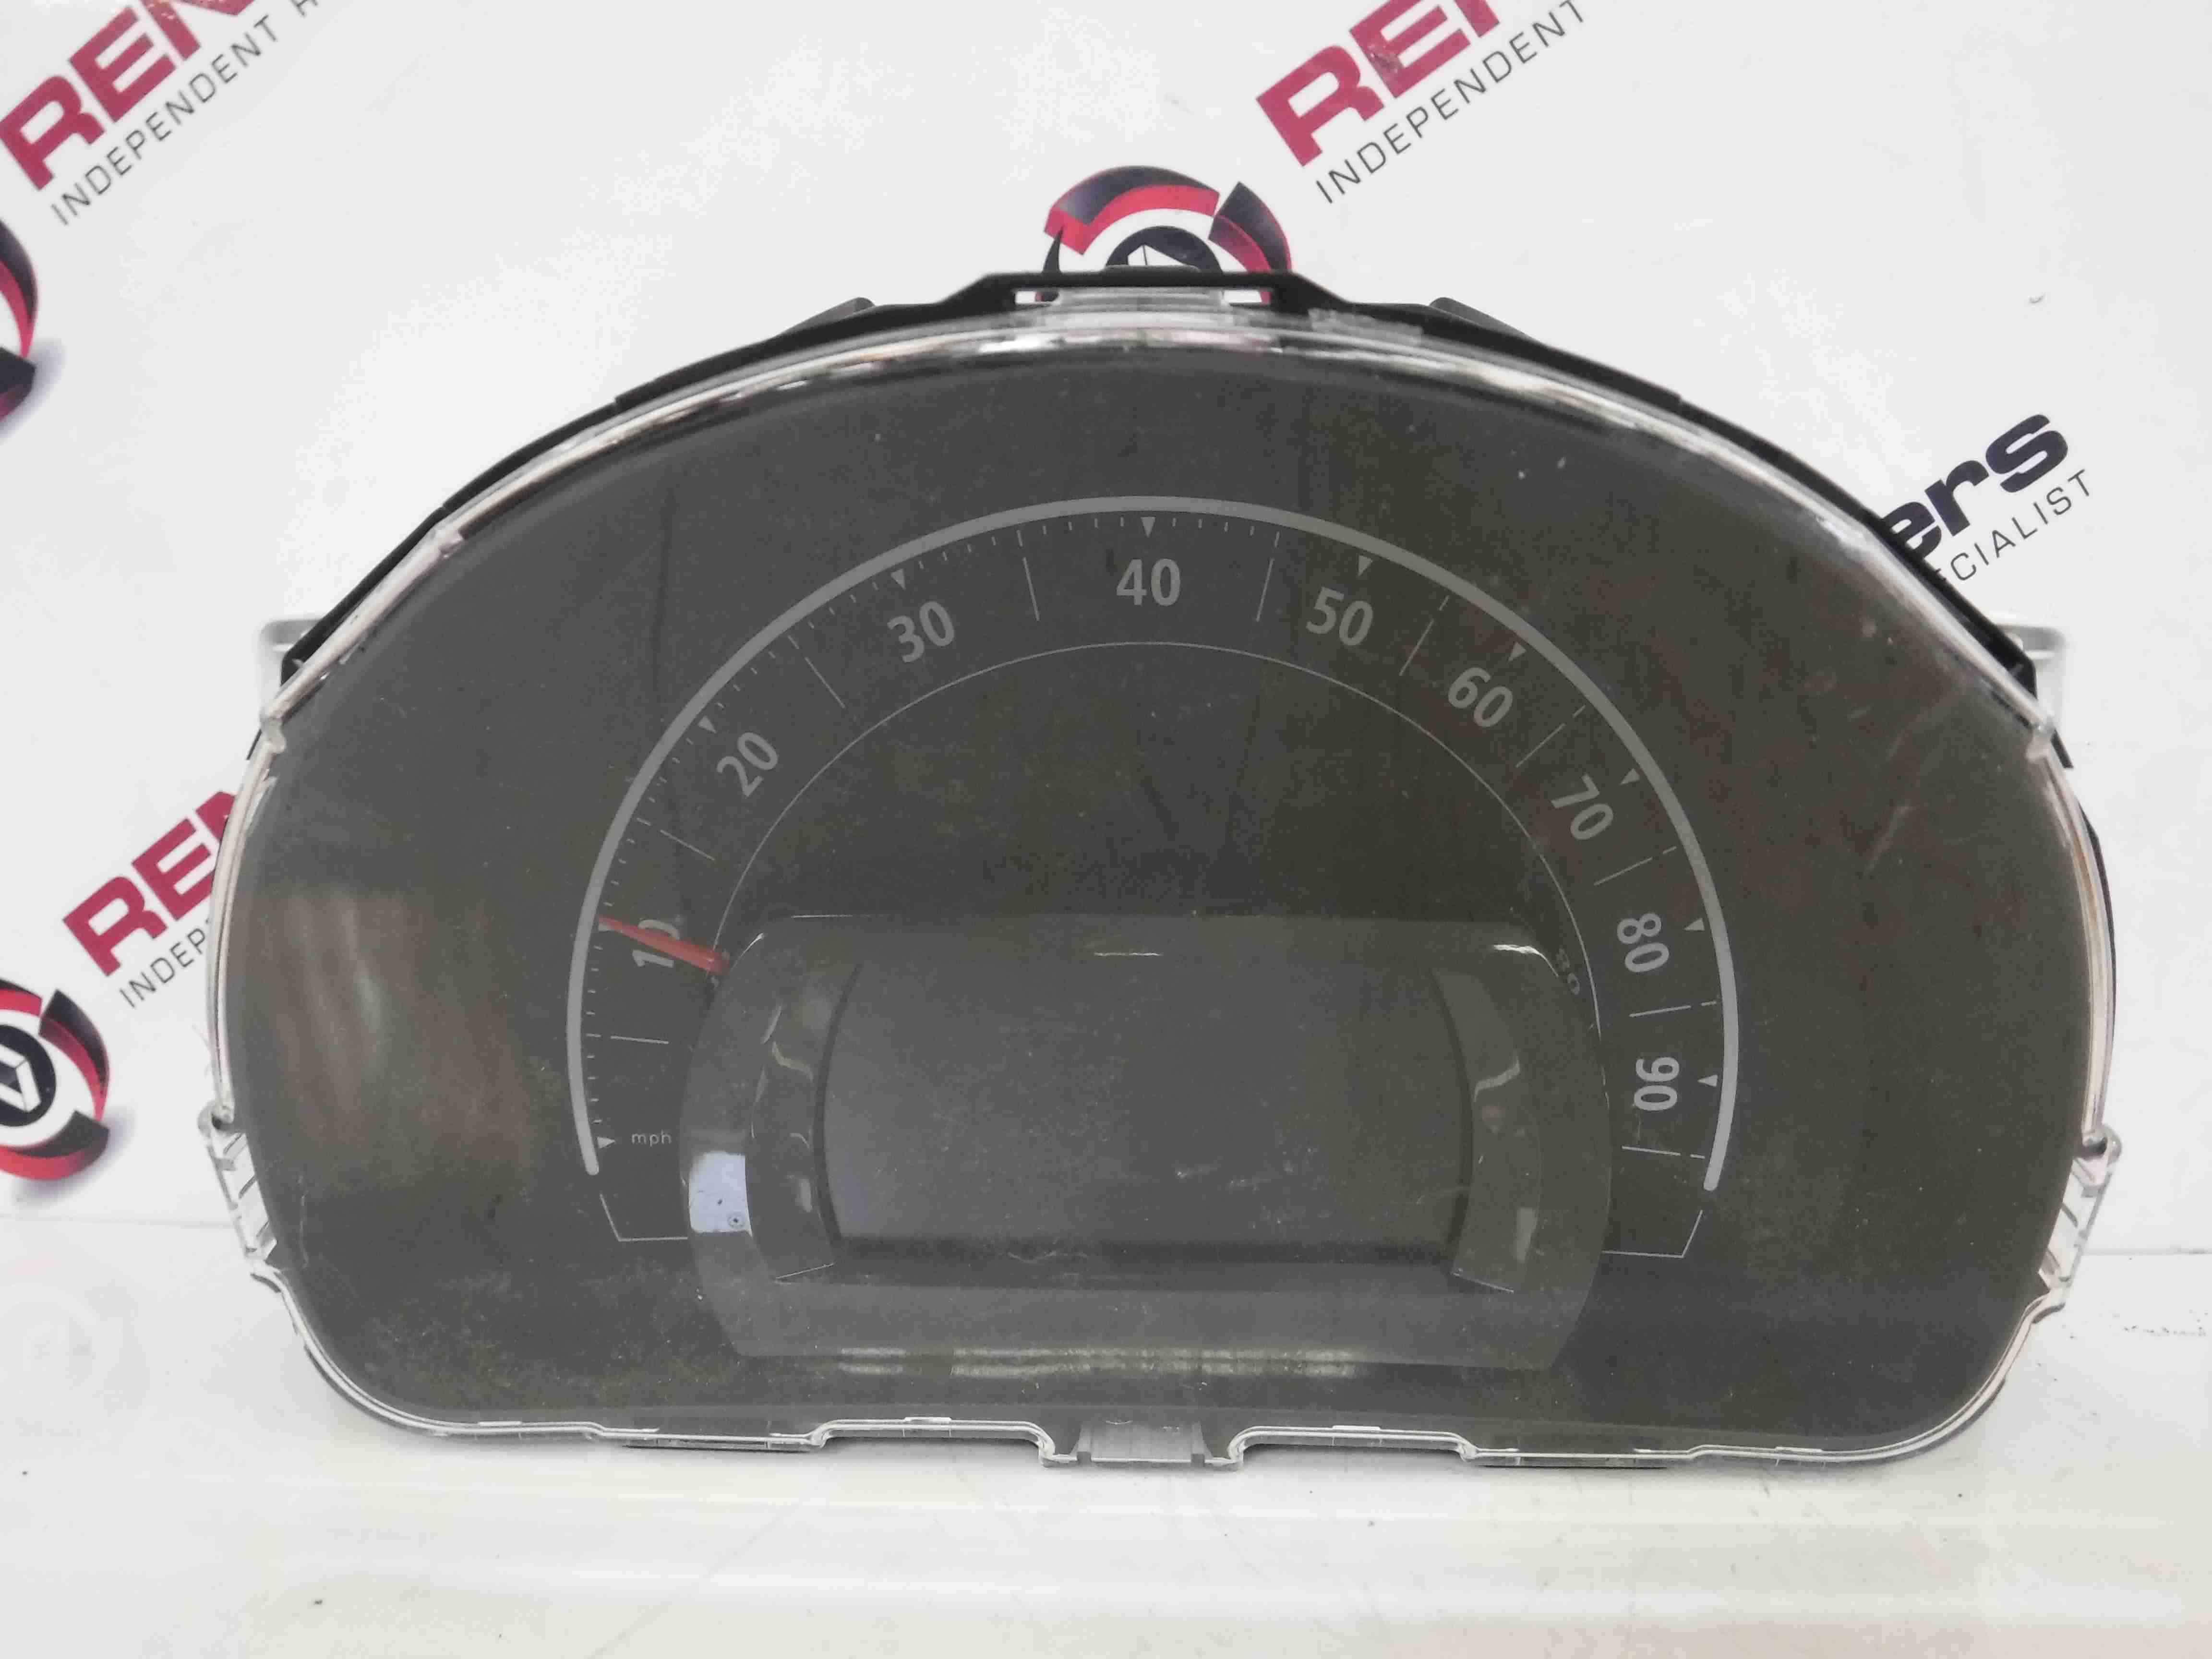 Renault Twingo 2014-2017 RS SCE Instrument Panel Dials Clocks 4K  248210214R